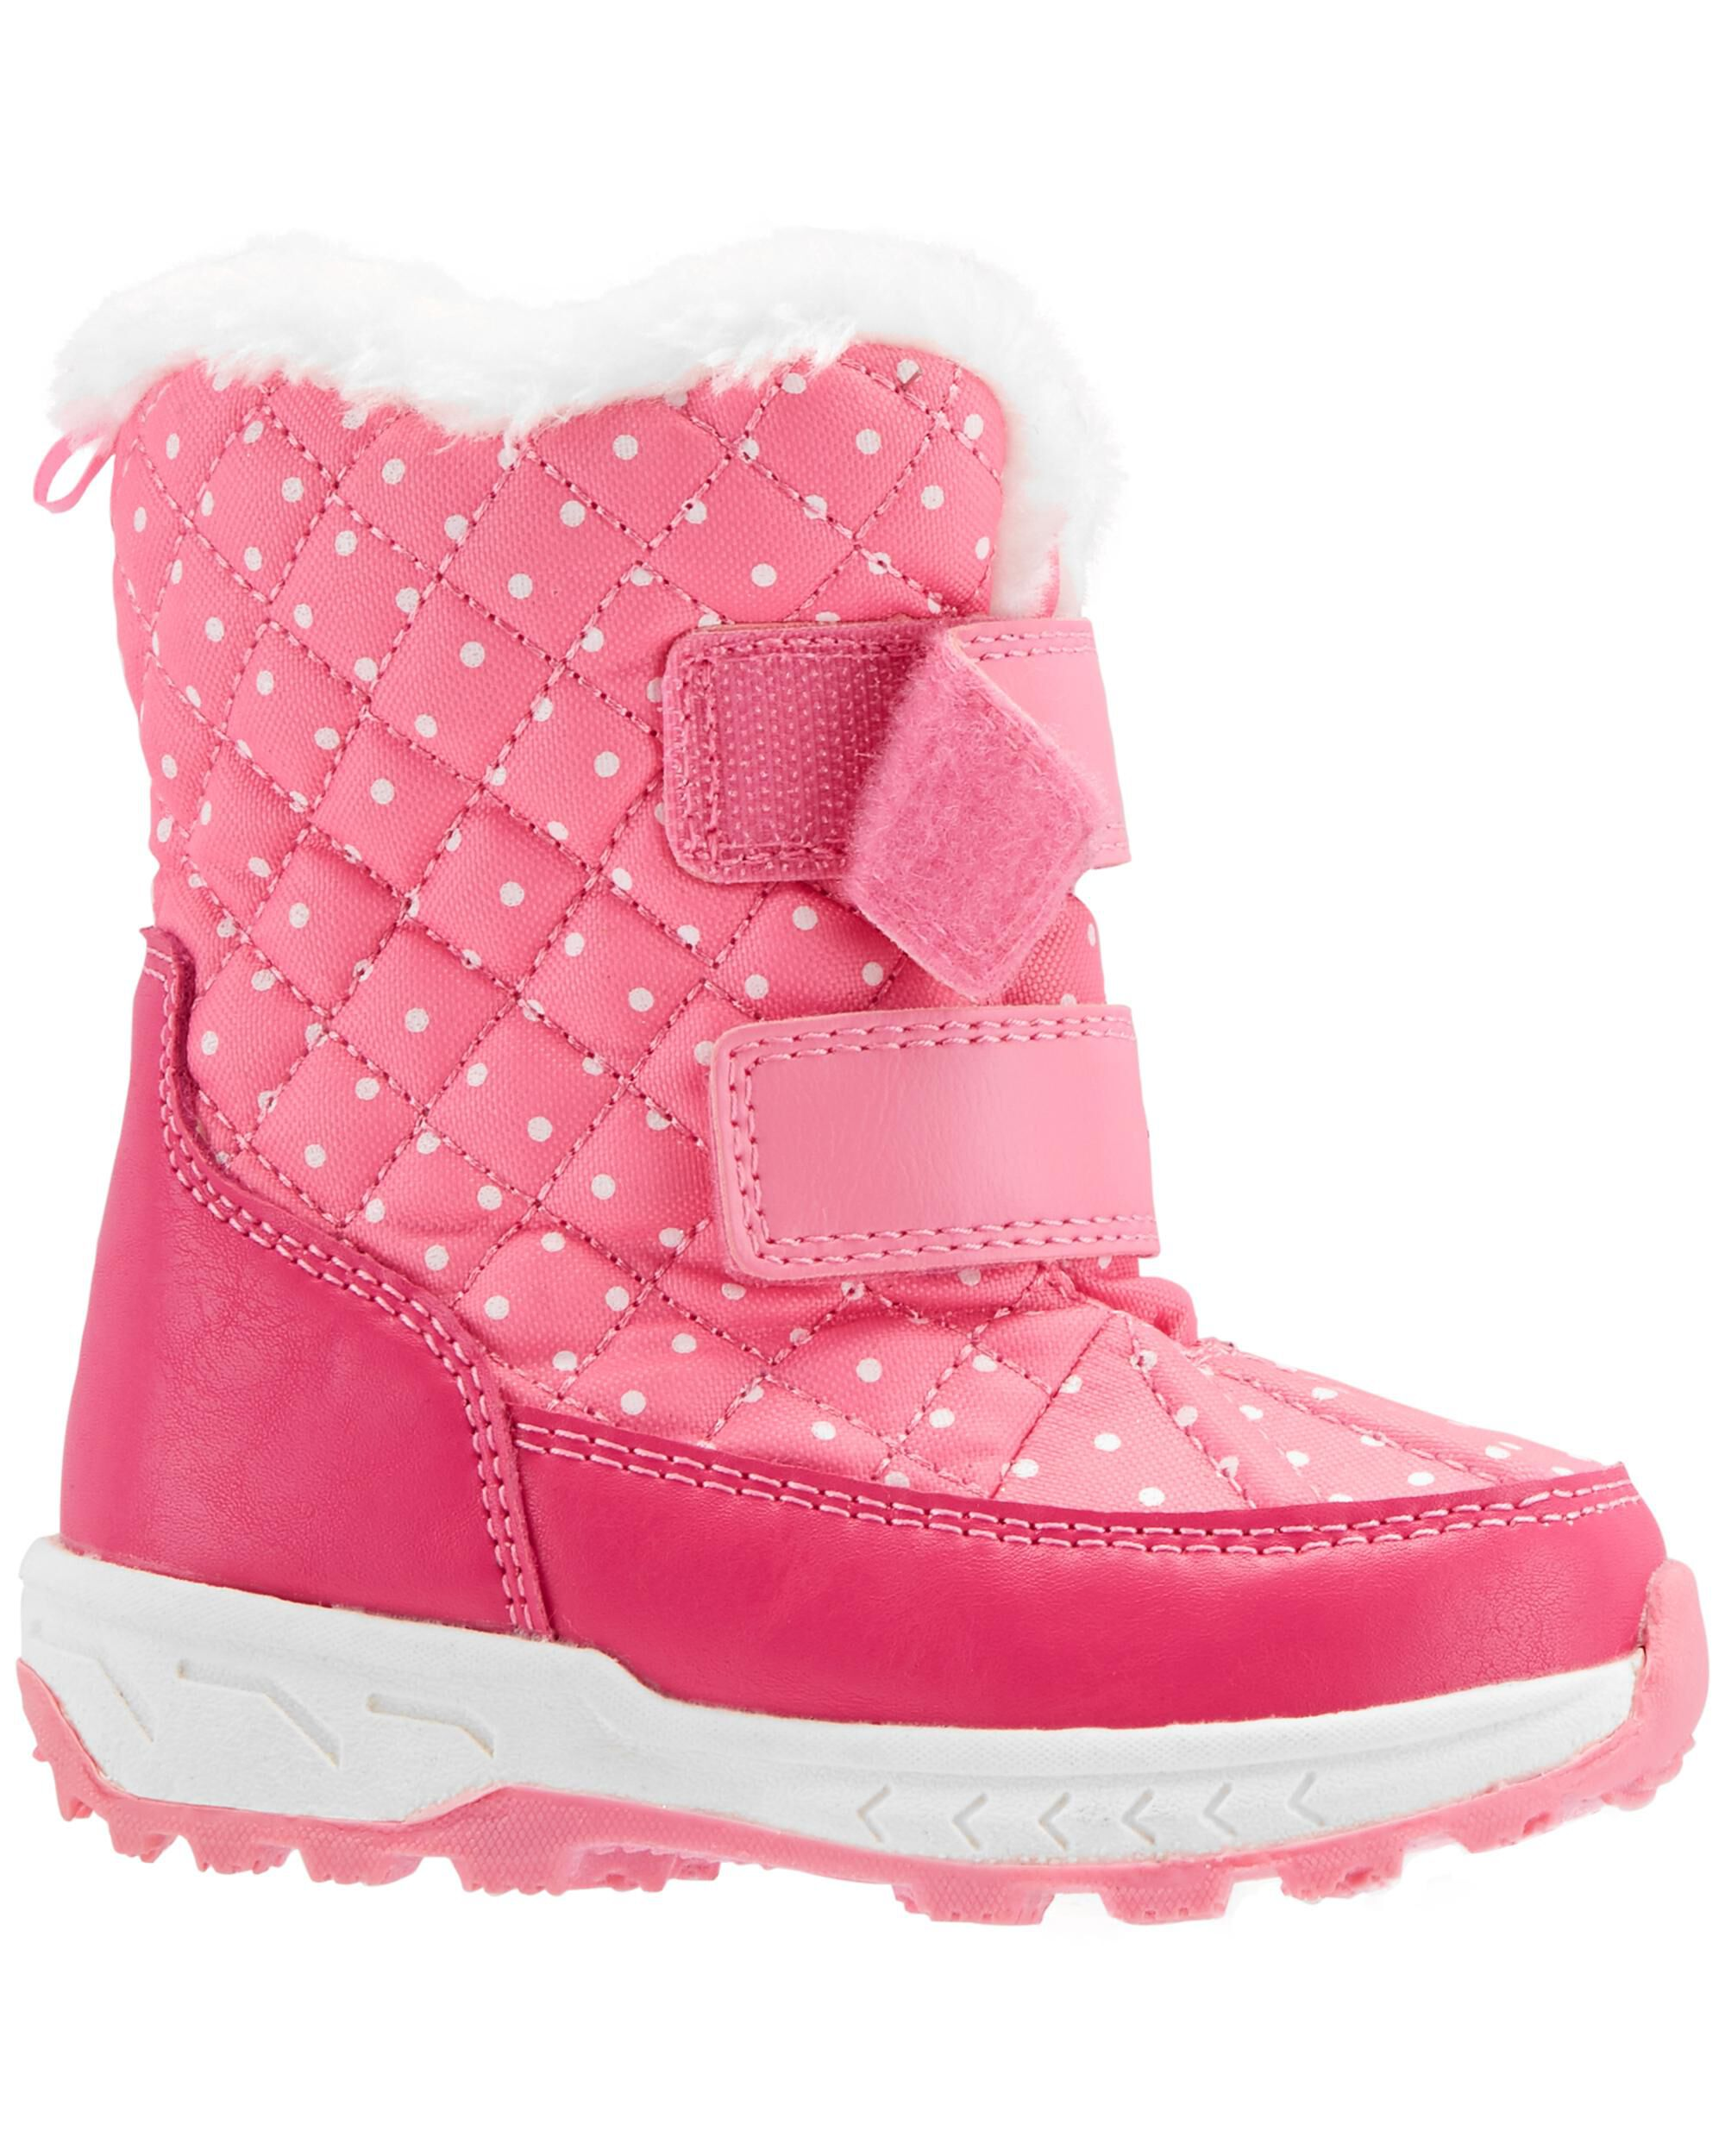 Carter's Polka Dot Snow Boots   carters.com